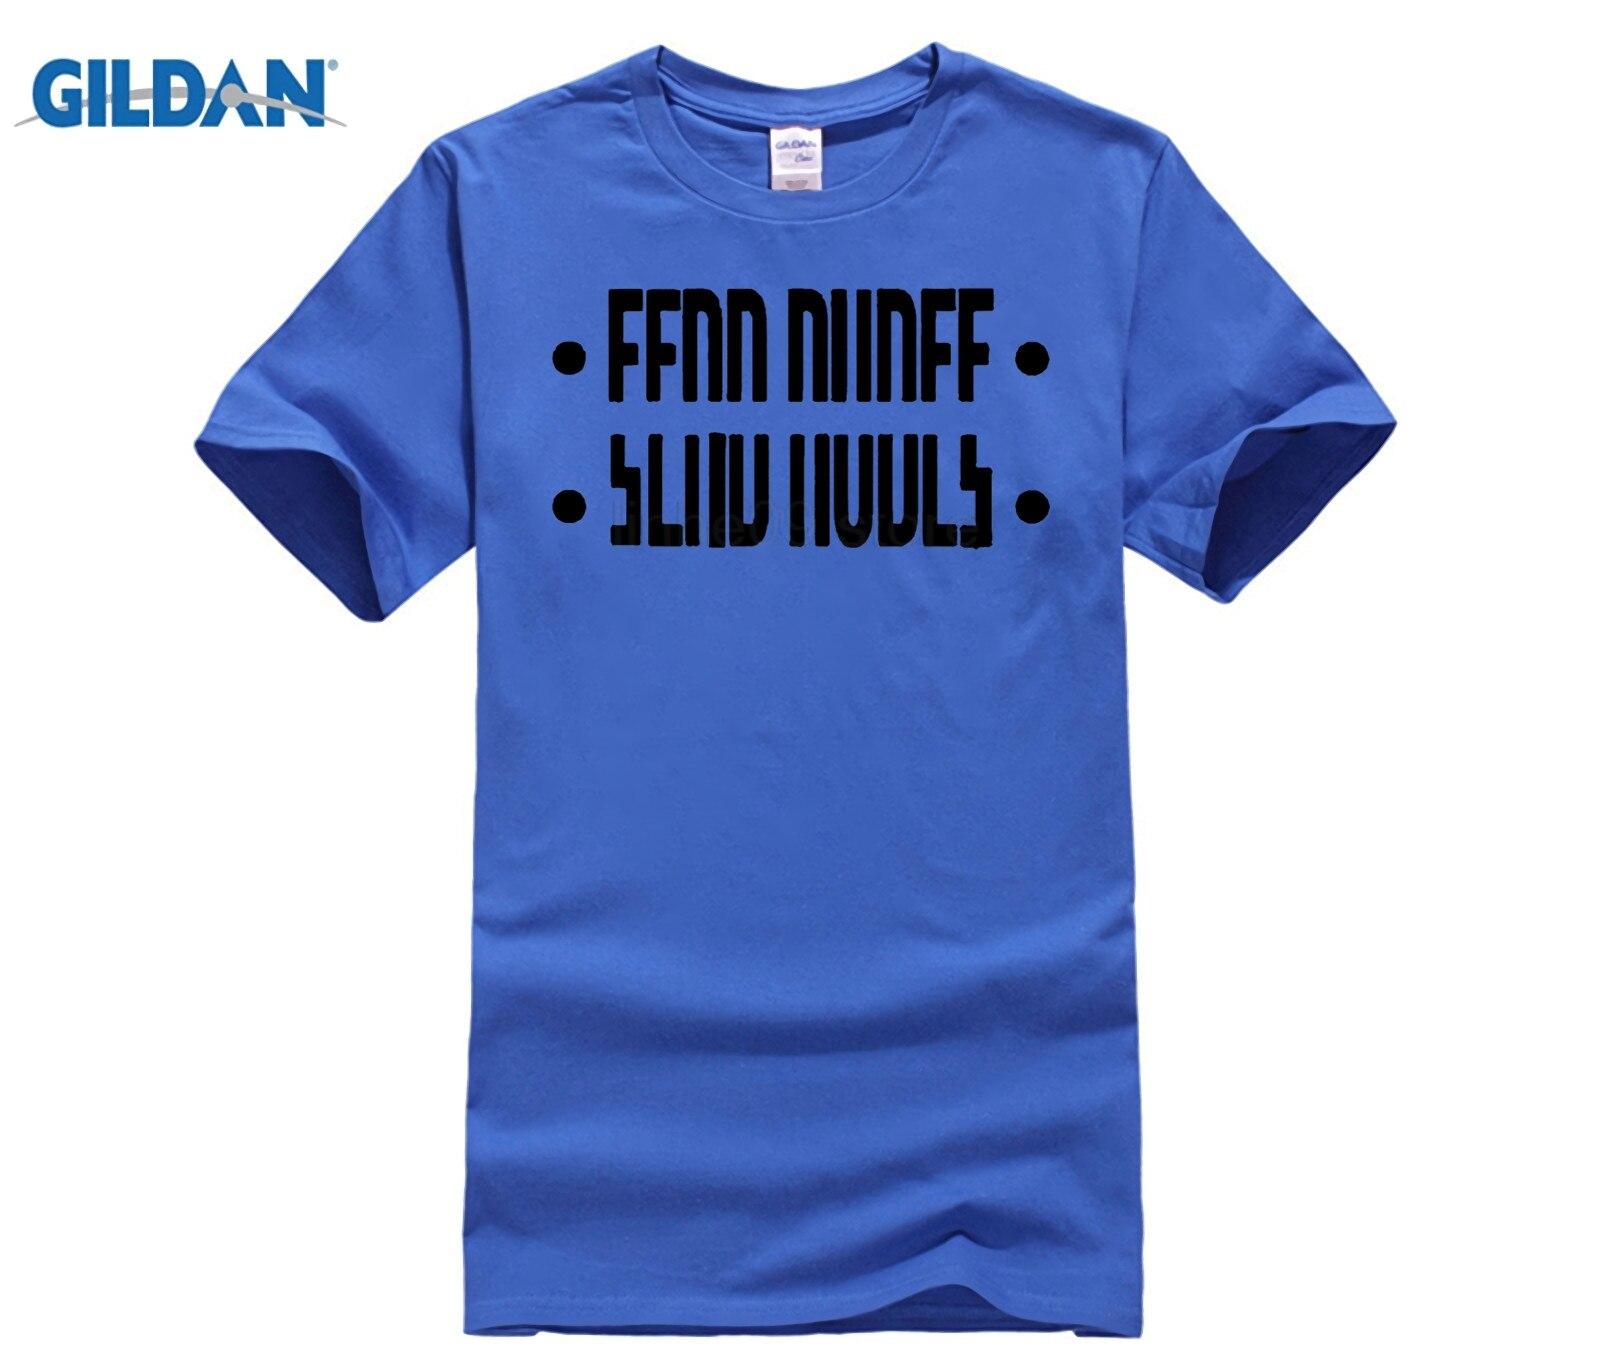 GILDAN Send Nudes - White T-Shirt Hidden Message Humor Funny All Sizes S-2XL Fashion T-Shirt Men Clothing T Shirts Men Casual